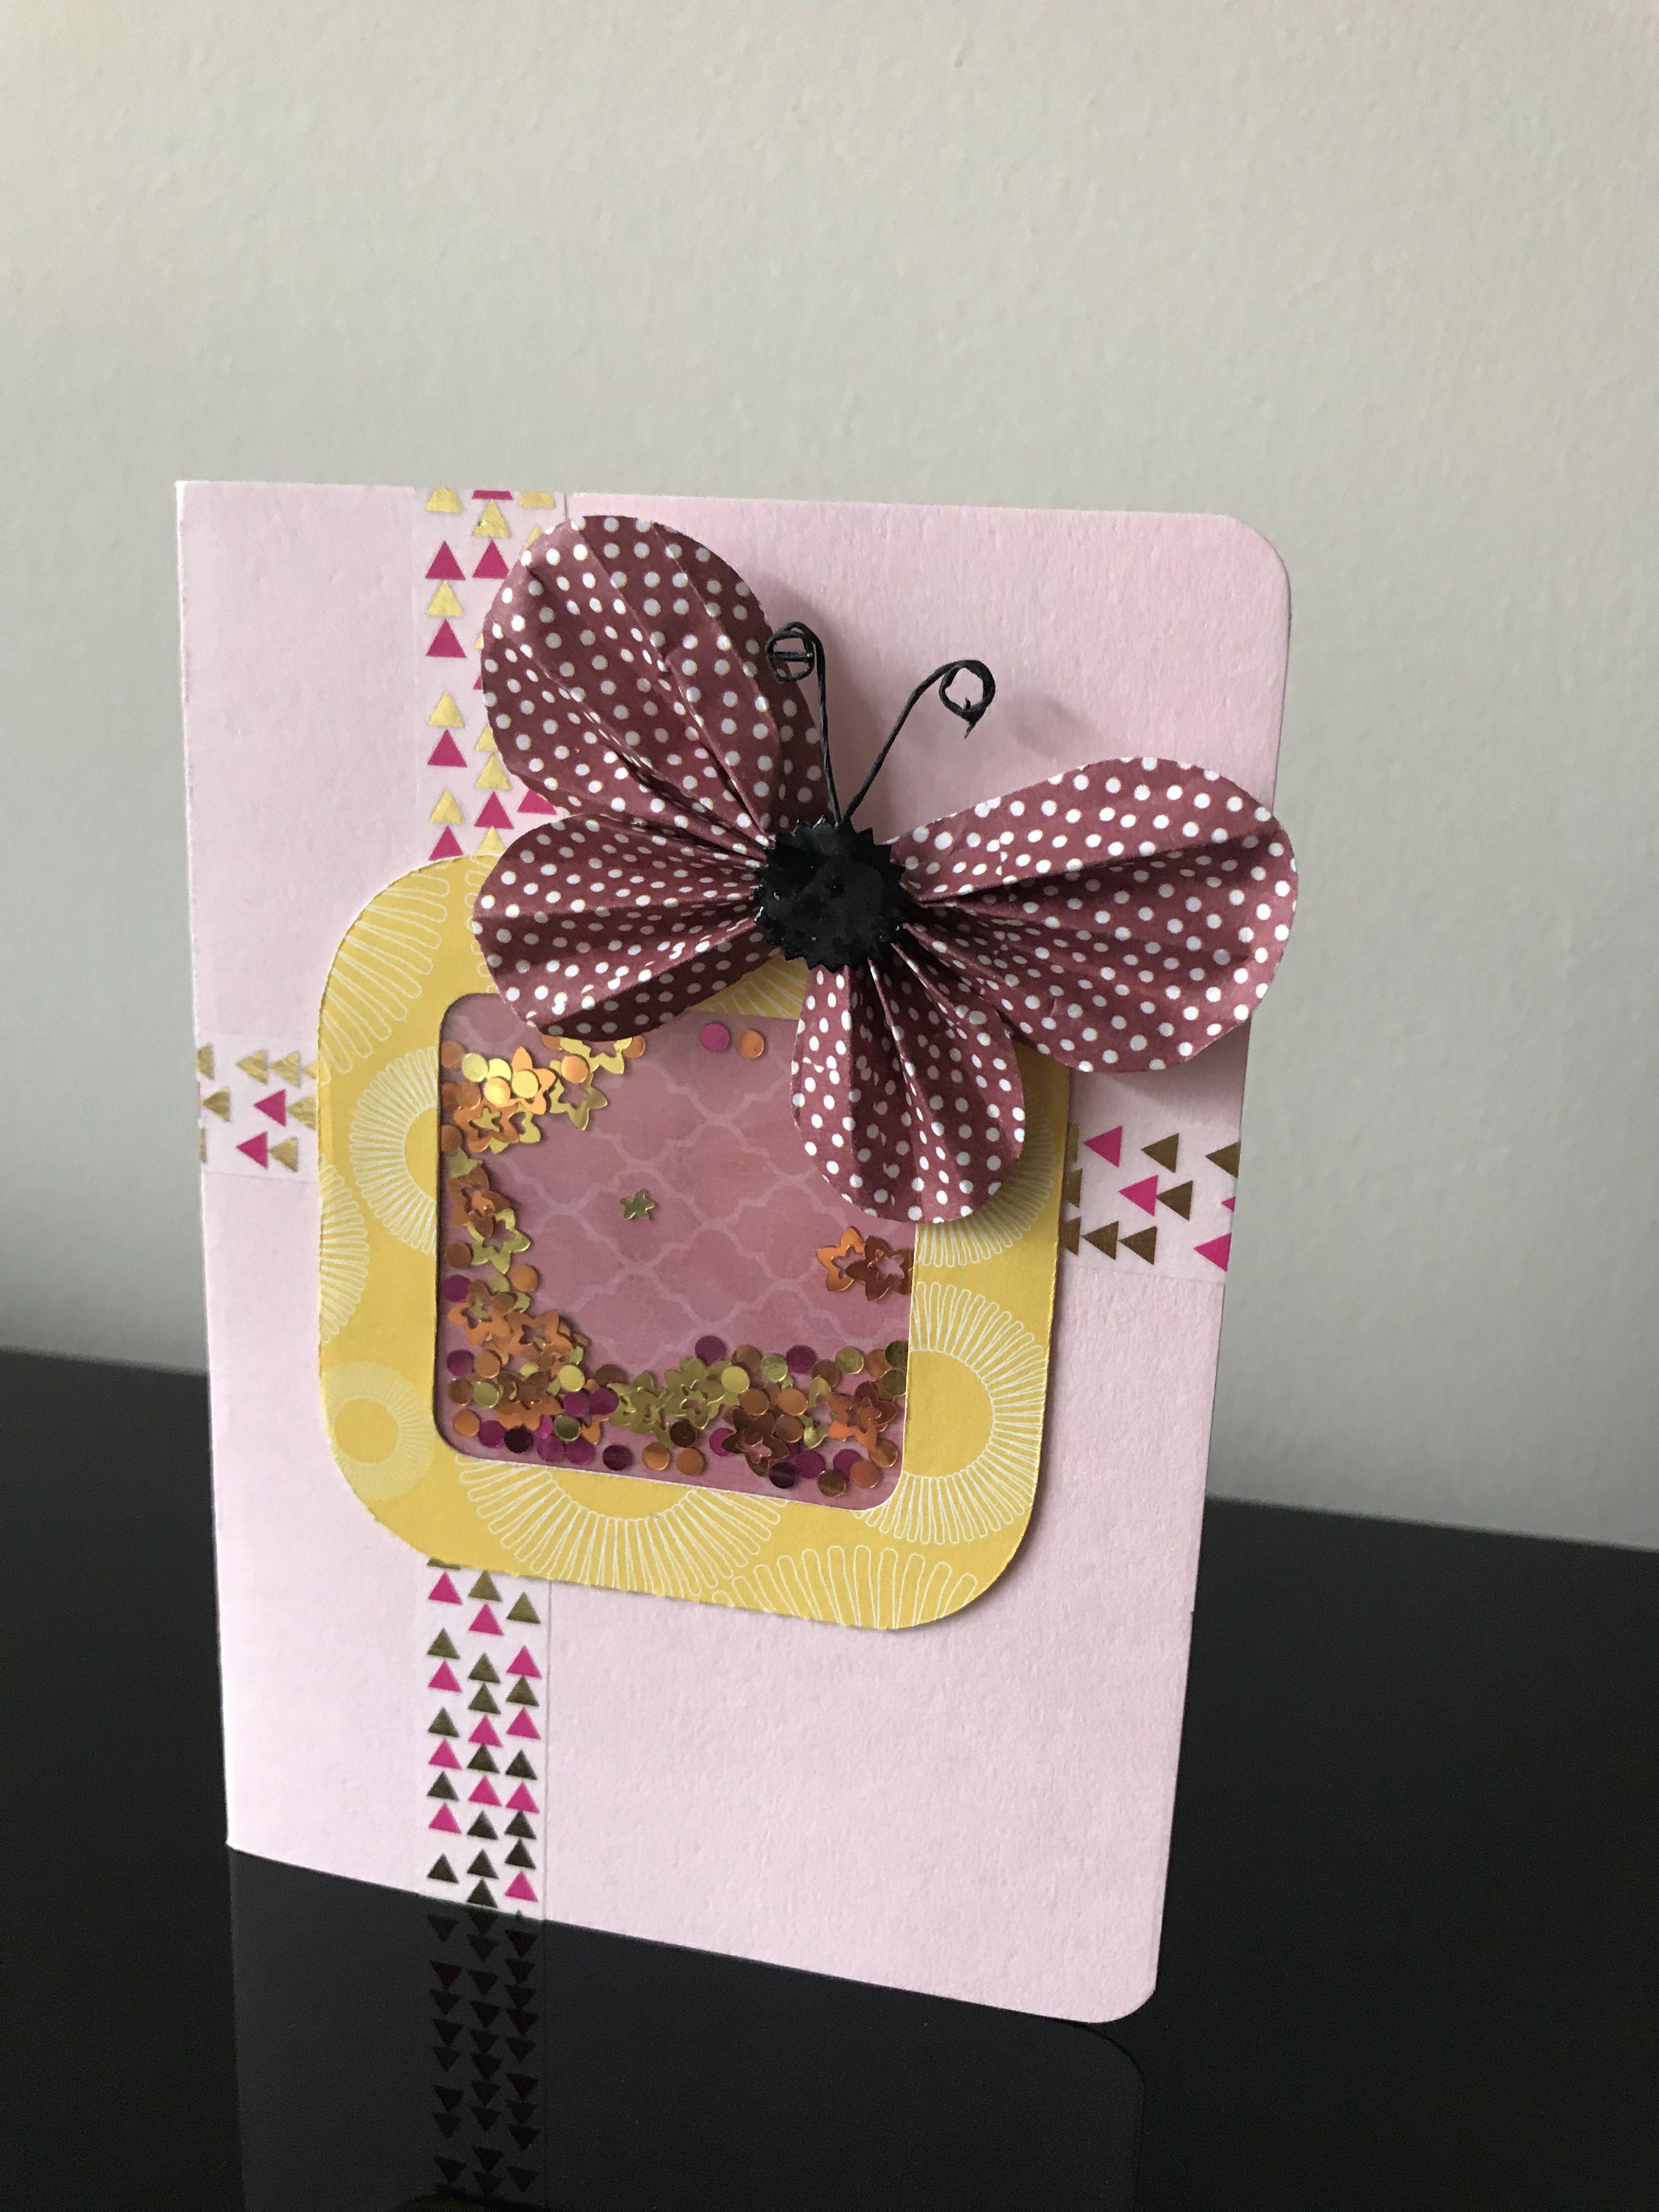 diy card handmade card embellishment shaker card diy